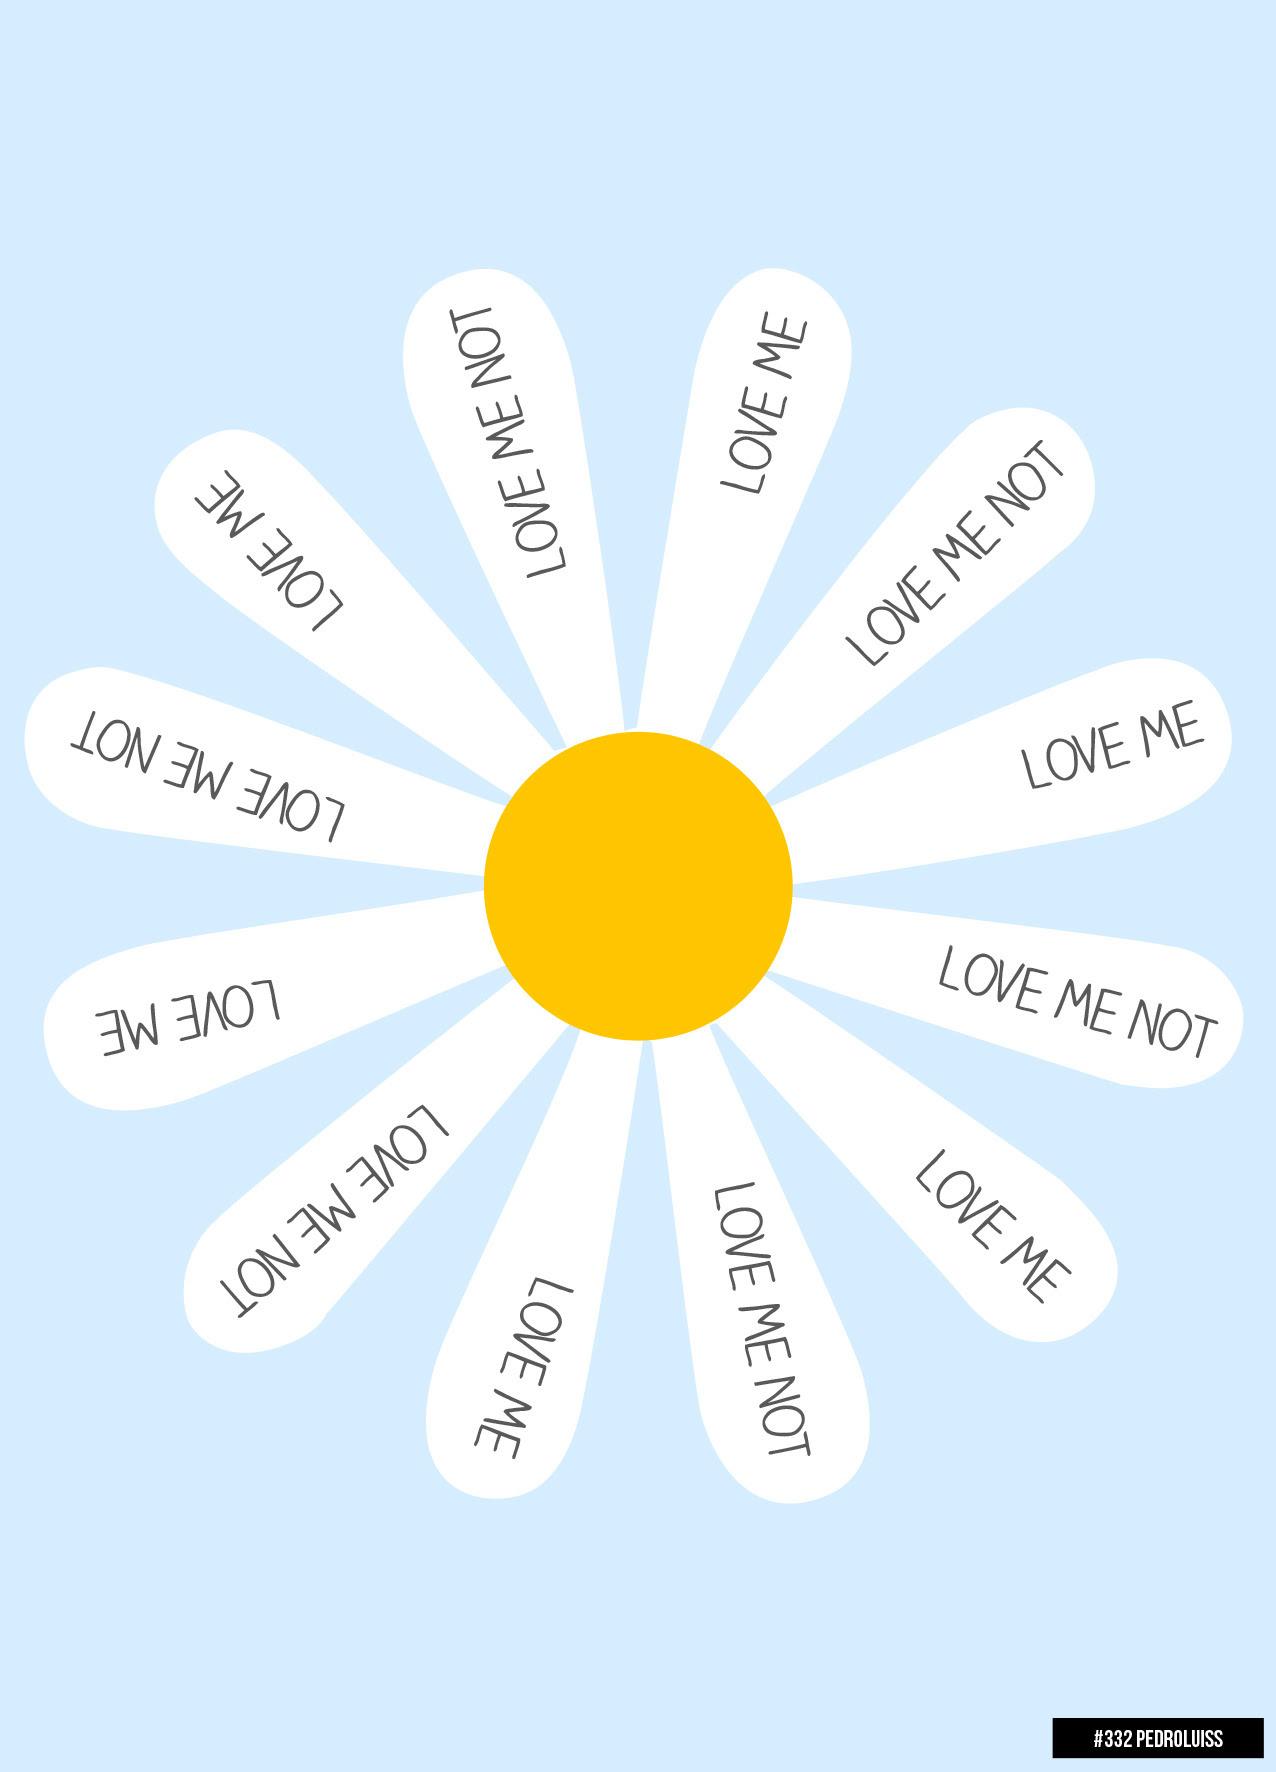 #332 - Love Me. Love Me Not. Love Me. Love Me Not.